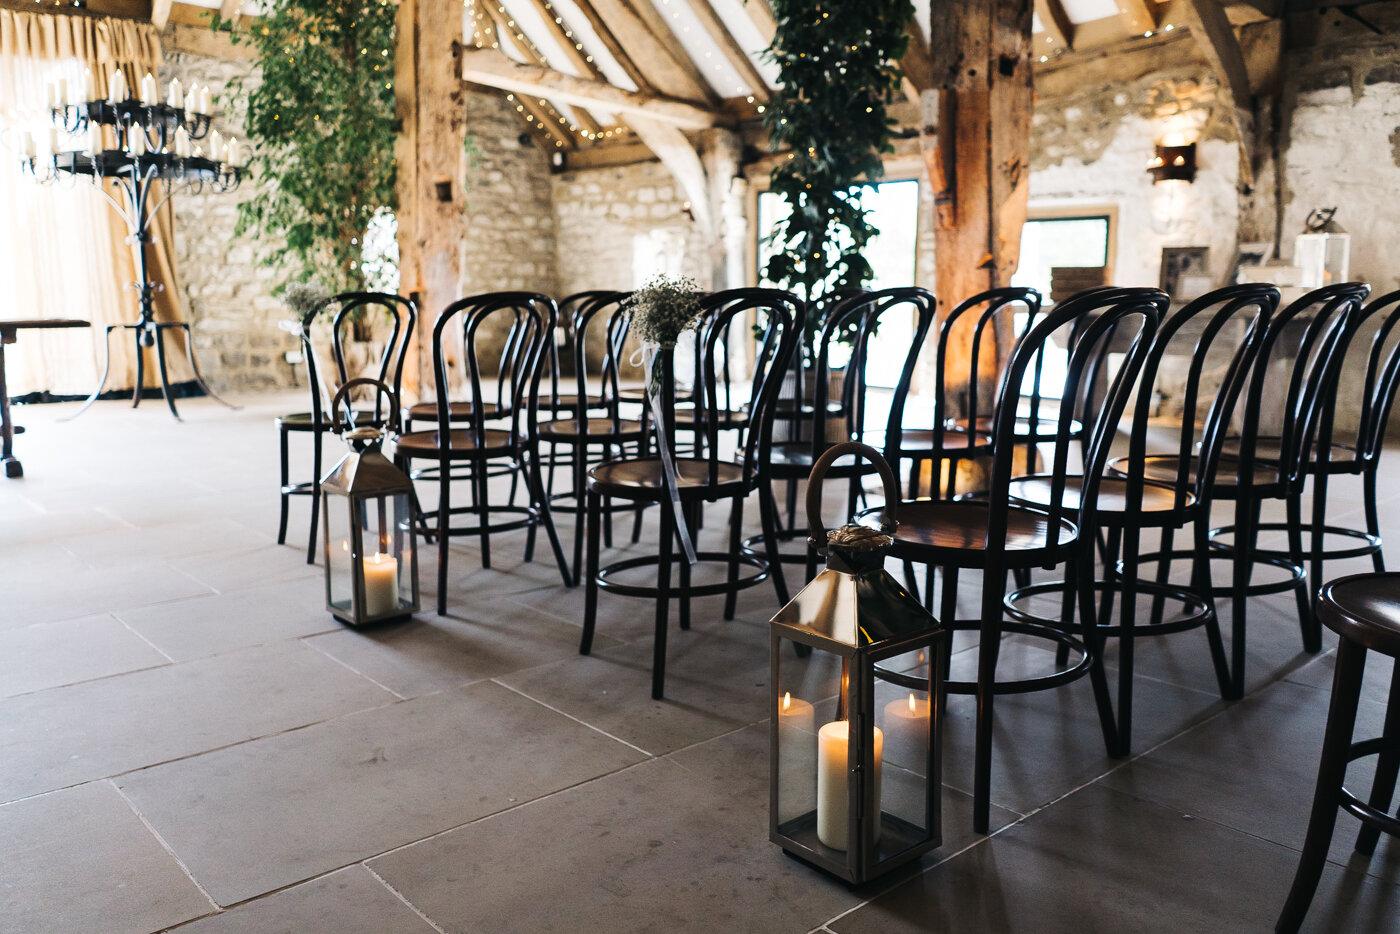 tithe-barn-bolton-abbey-north-yorkshire-cripps-wedding-photographer-creative-0014.jpg